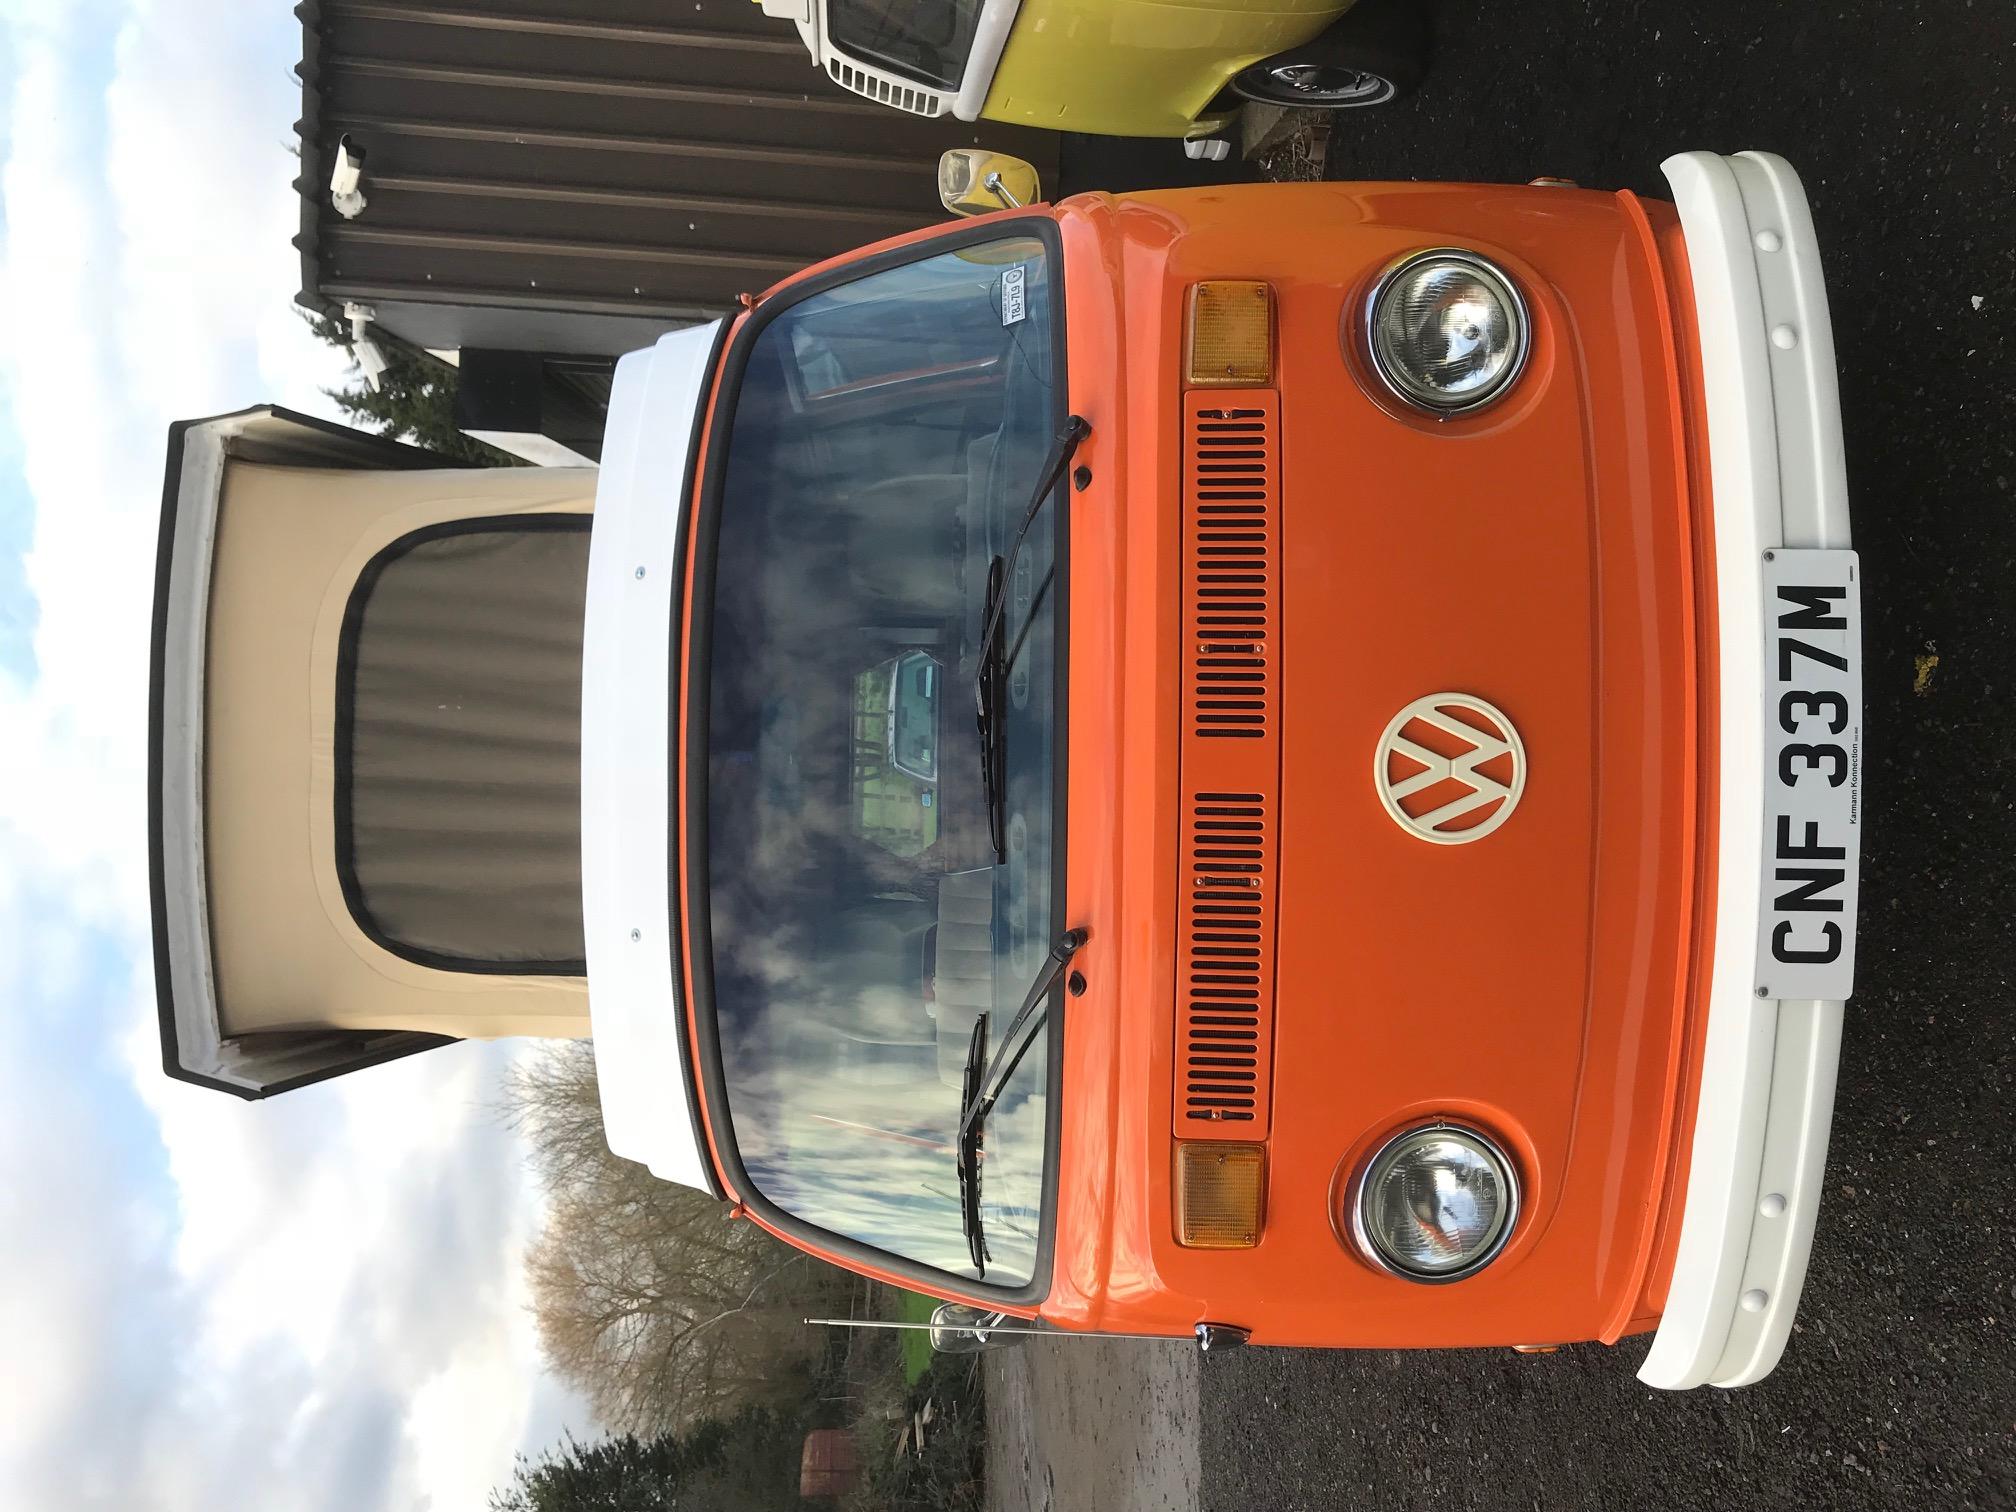 VW Westfalia Camper Van